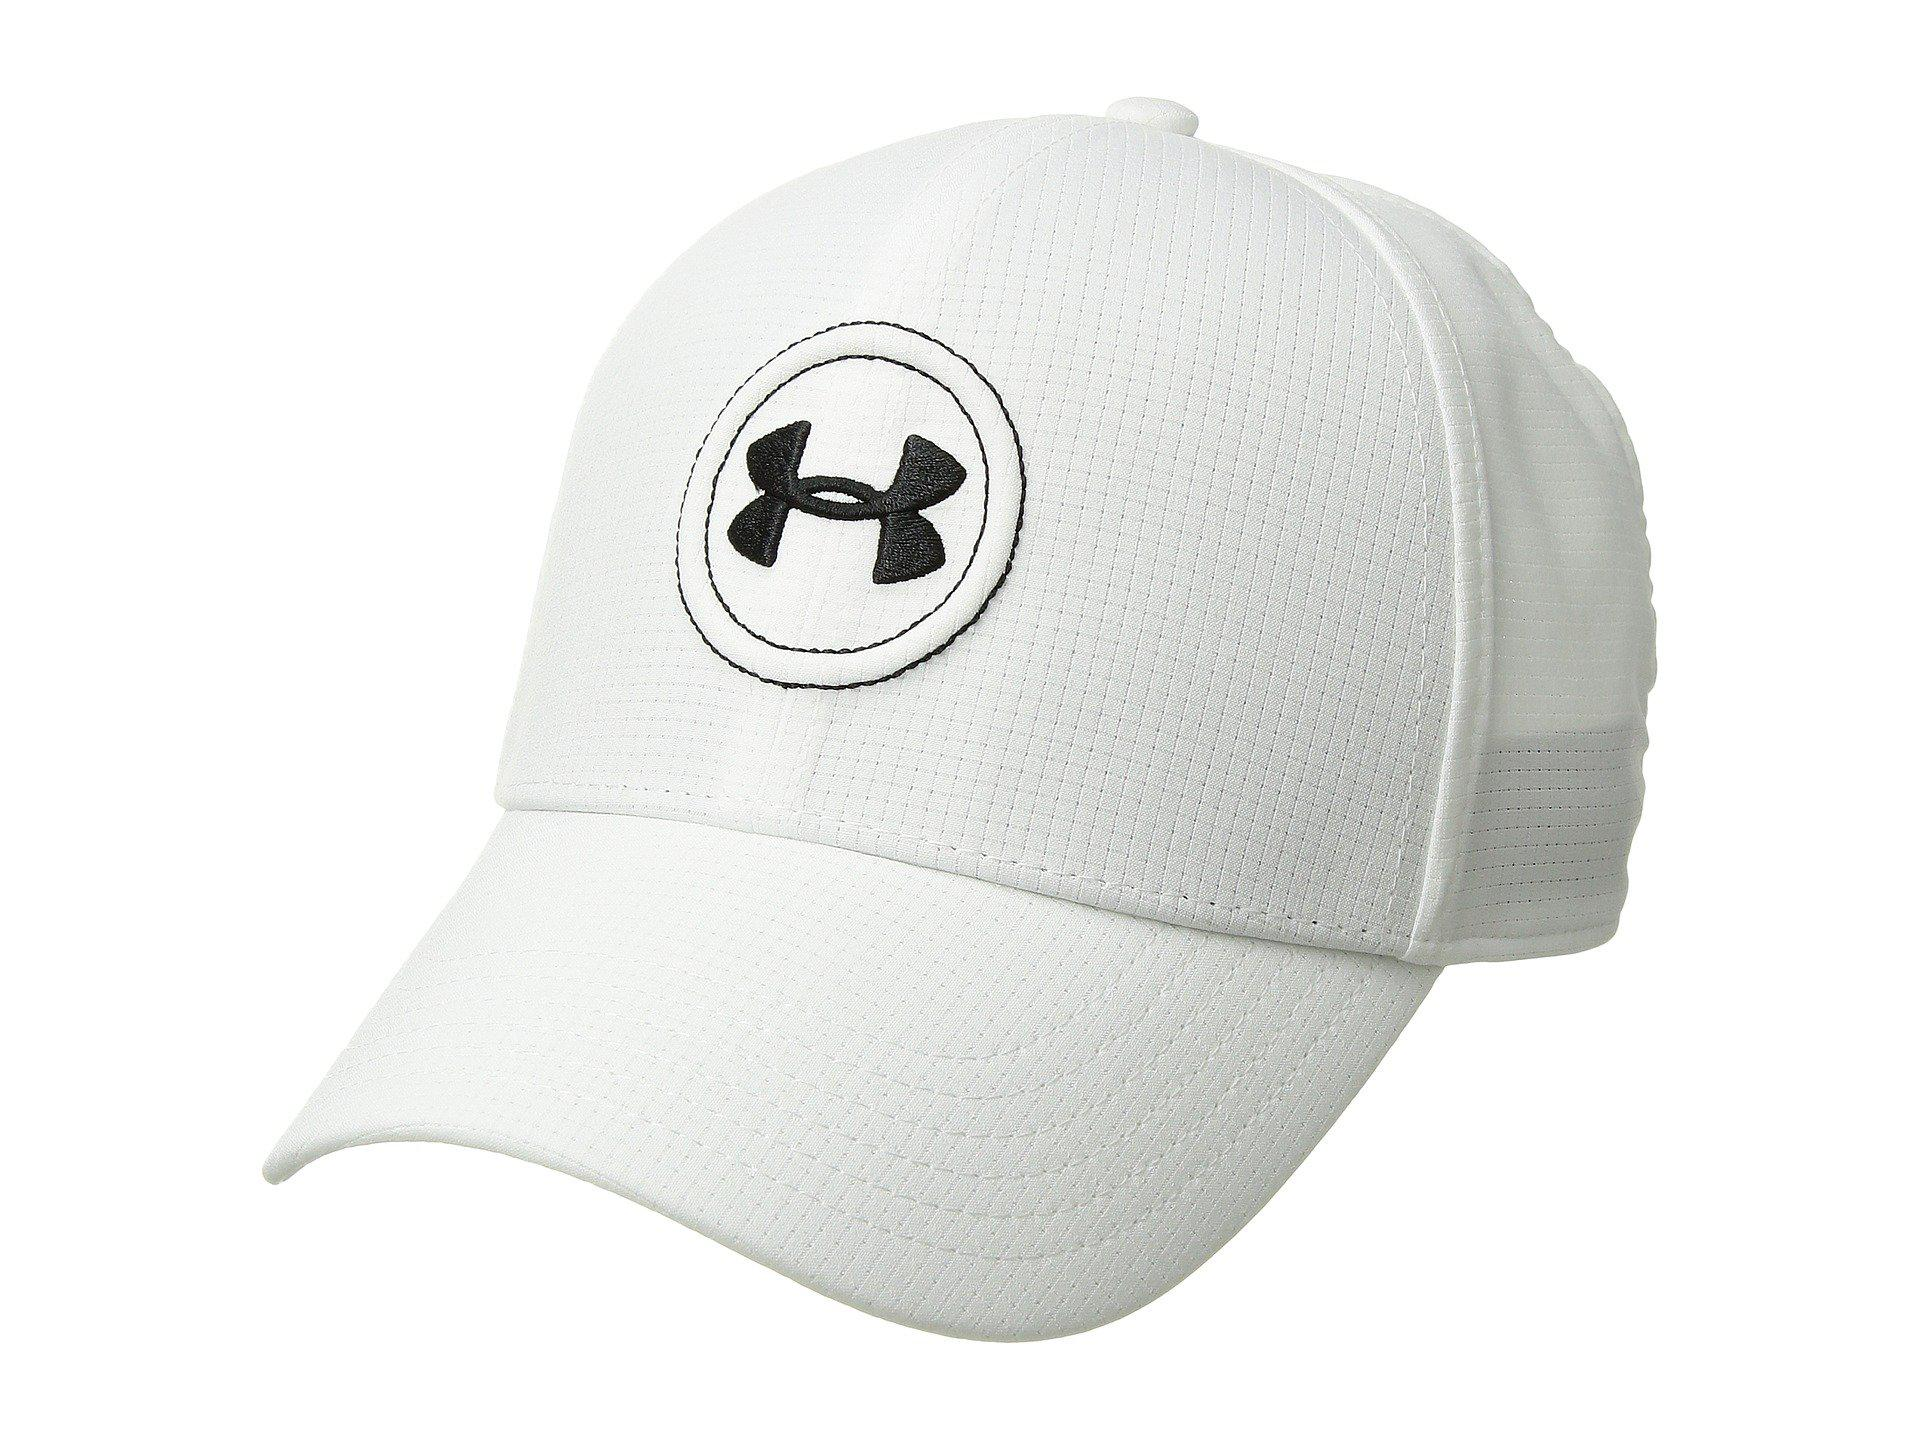 8f762f9b933 Lyst - Under Armour Ua Tour Cap in White for Men